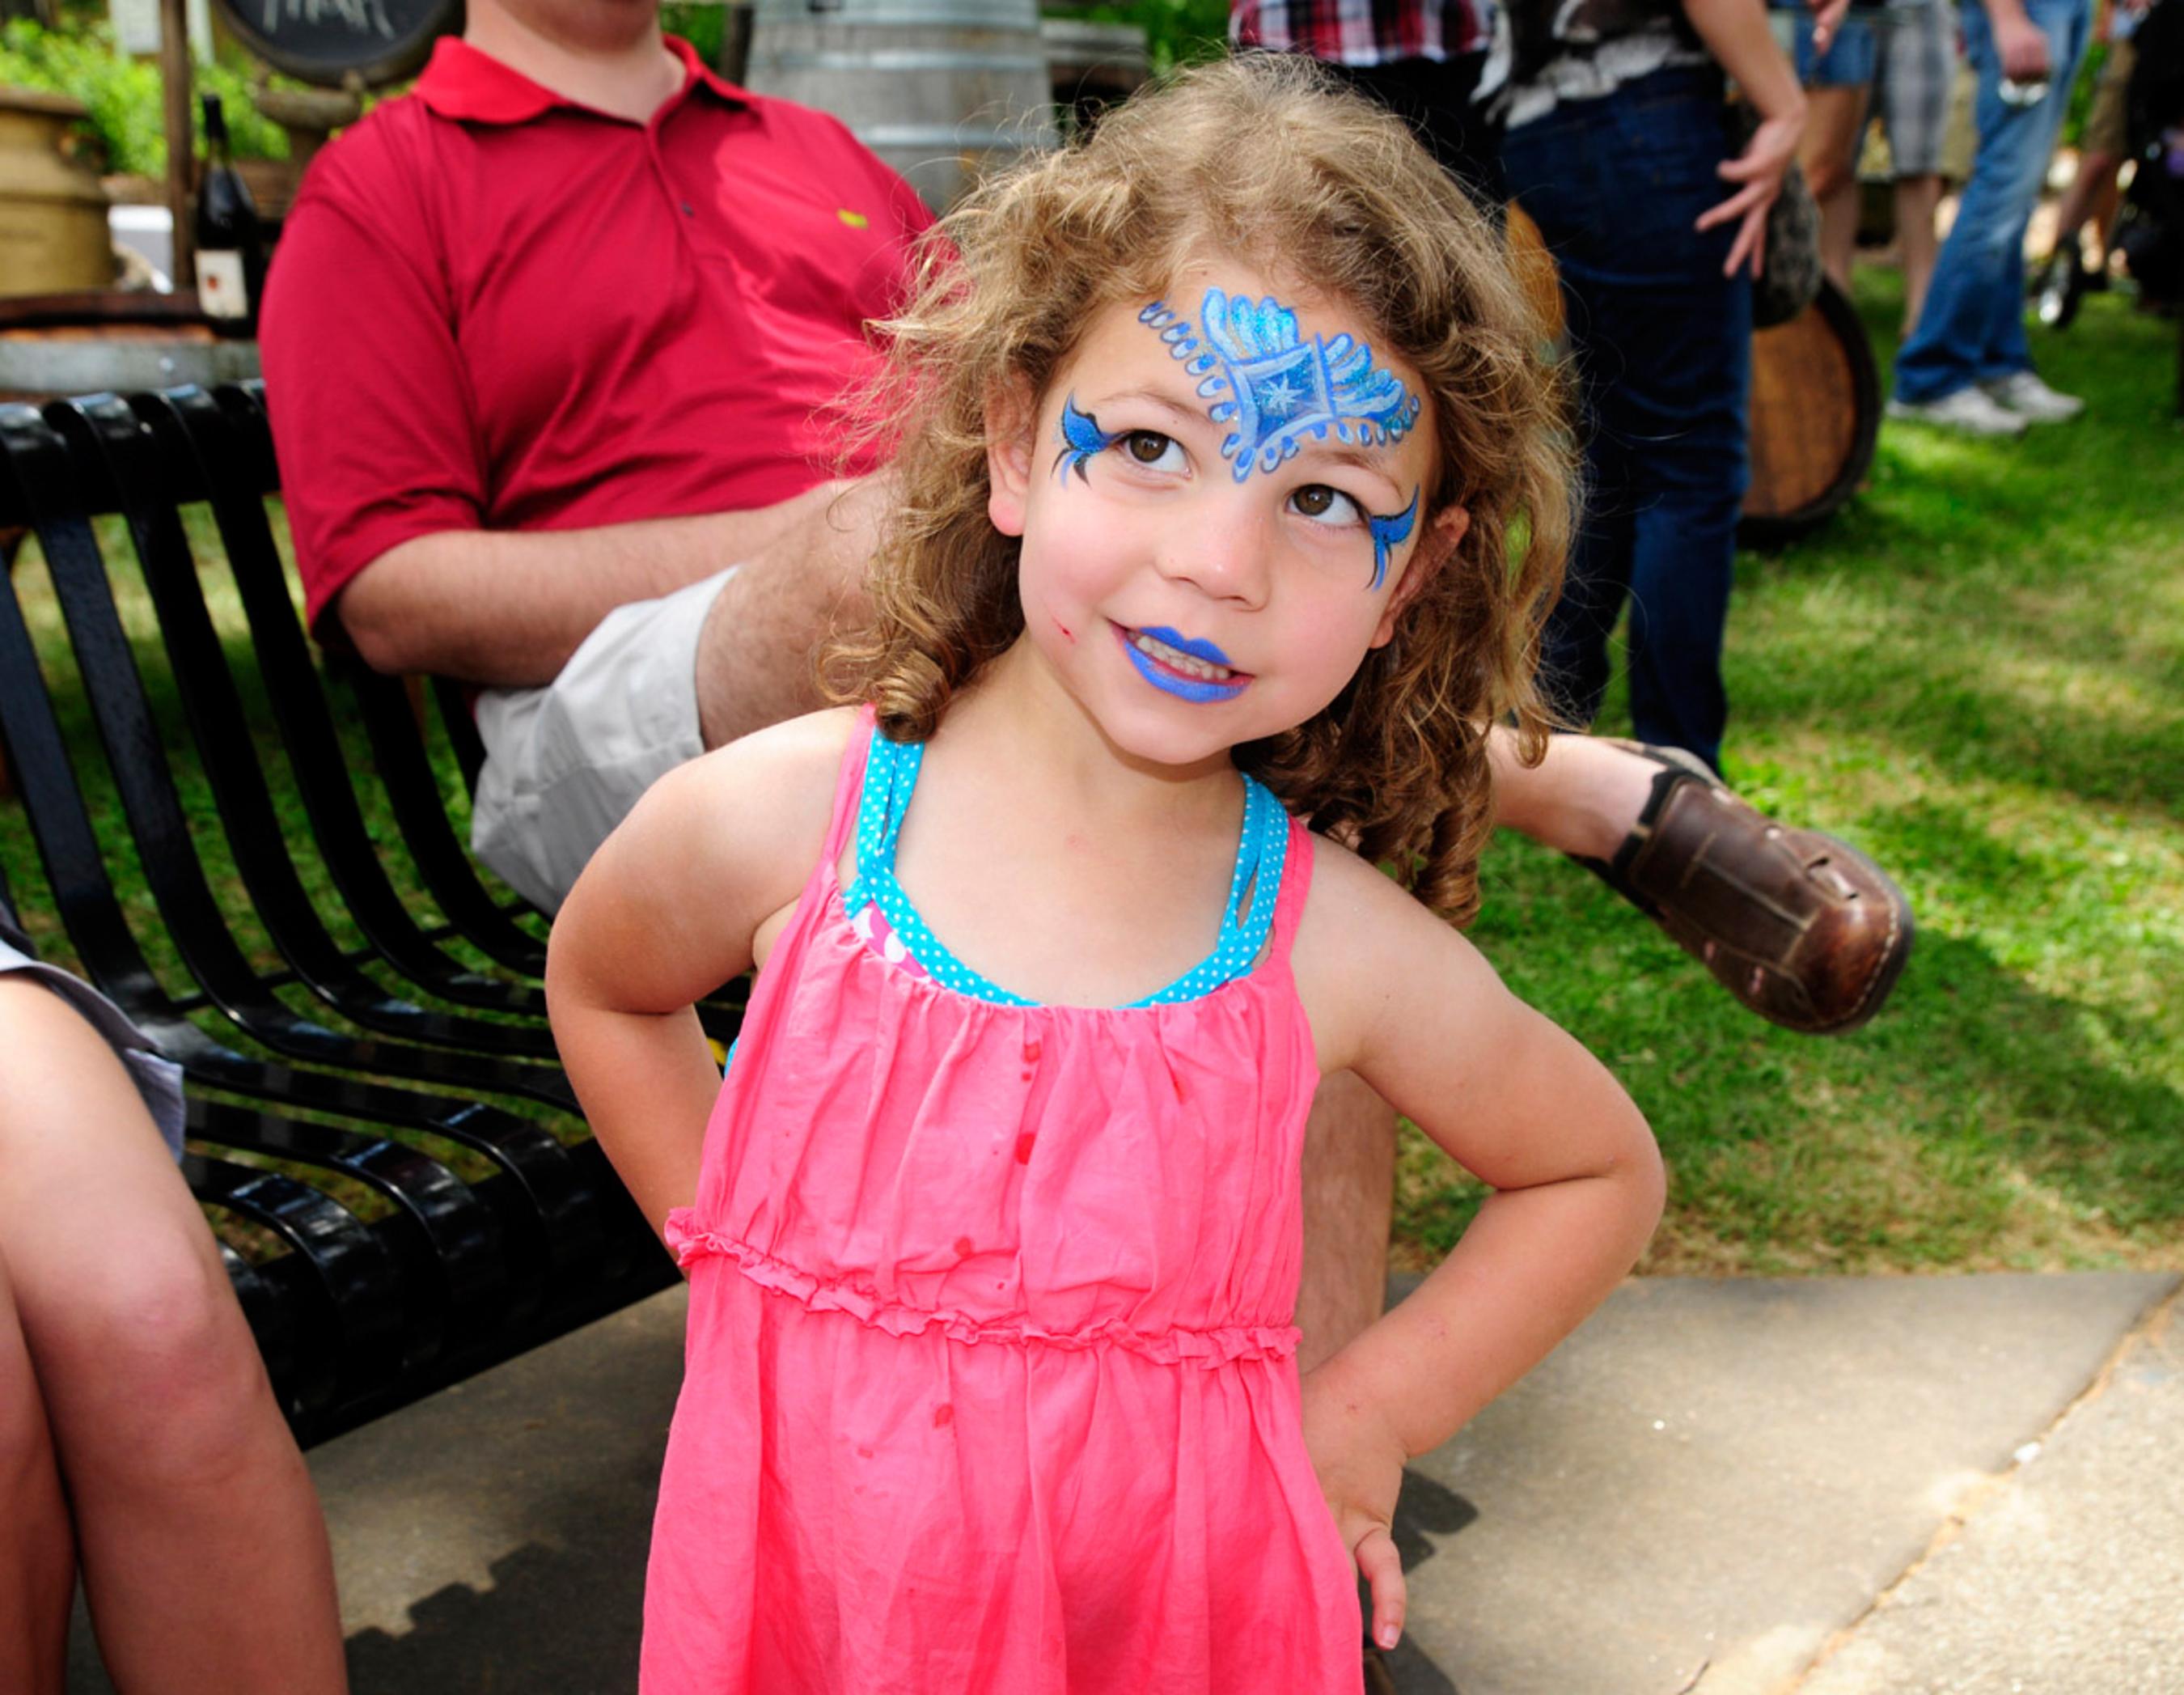 Third Annual Fall Festival on Ponce.(PRNewsFoto/The Atlanta Foundation for Public Spaces) (PRNewsFoto/ATLANTA FOUNDATION FOR PUBLIC...)